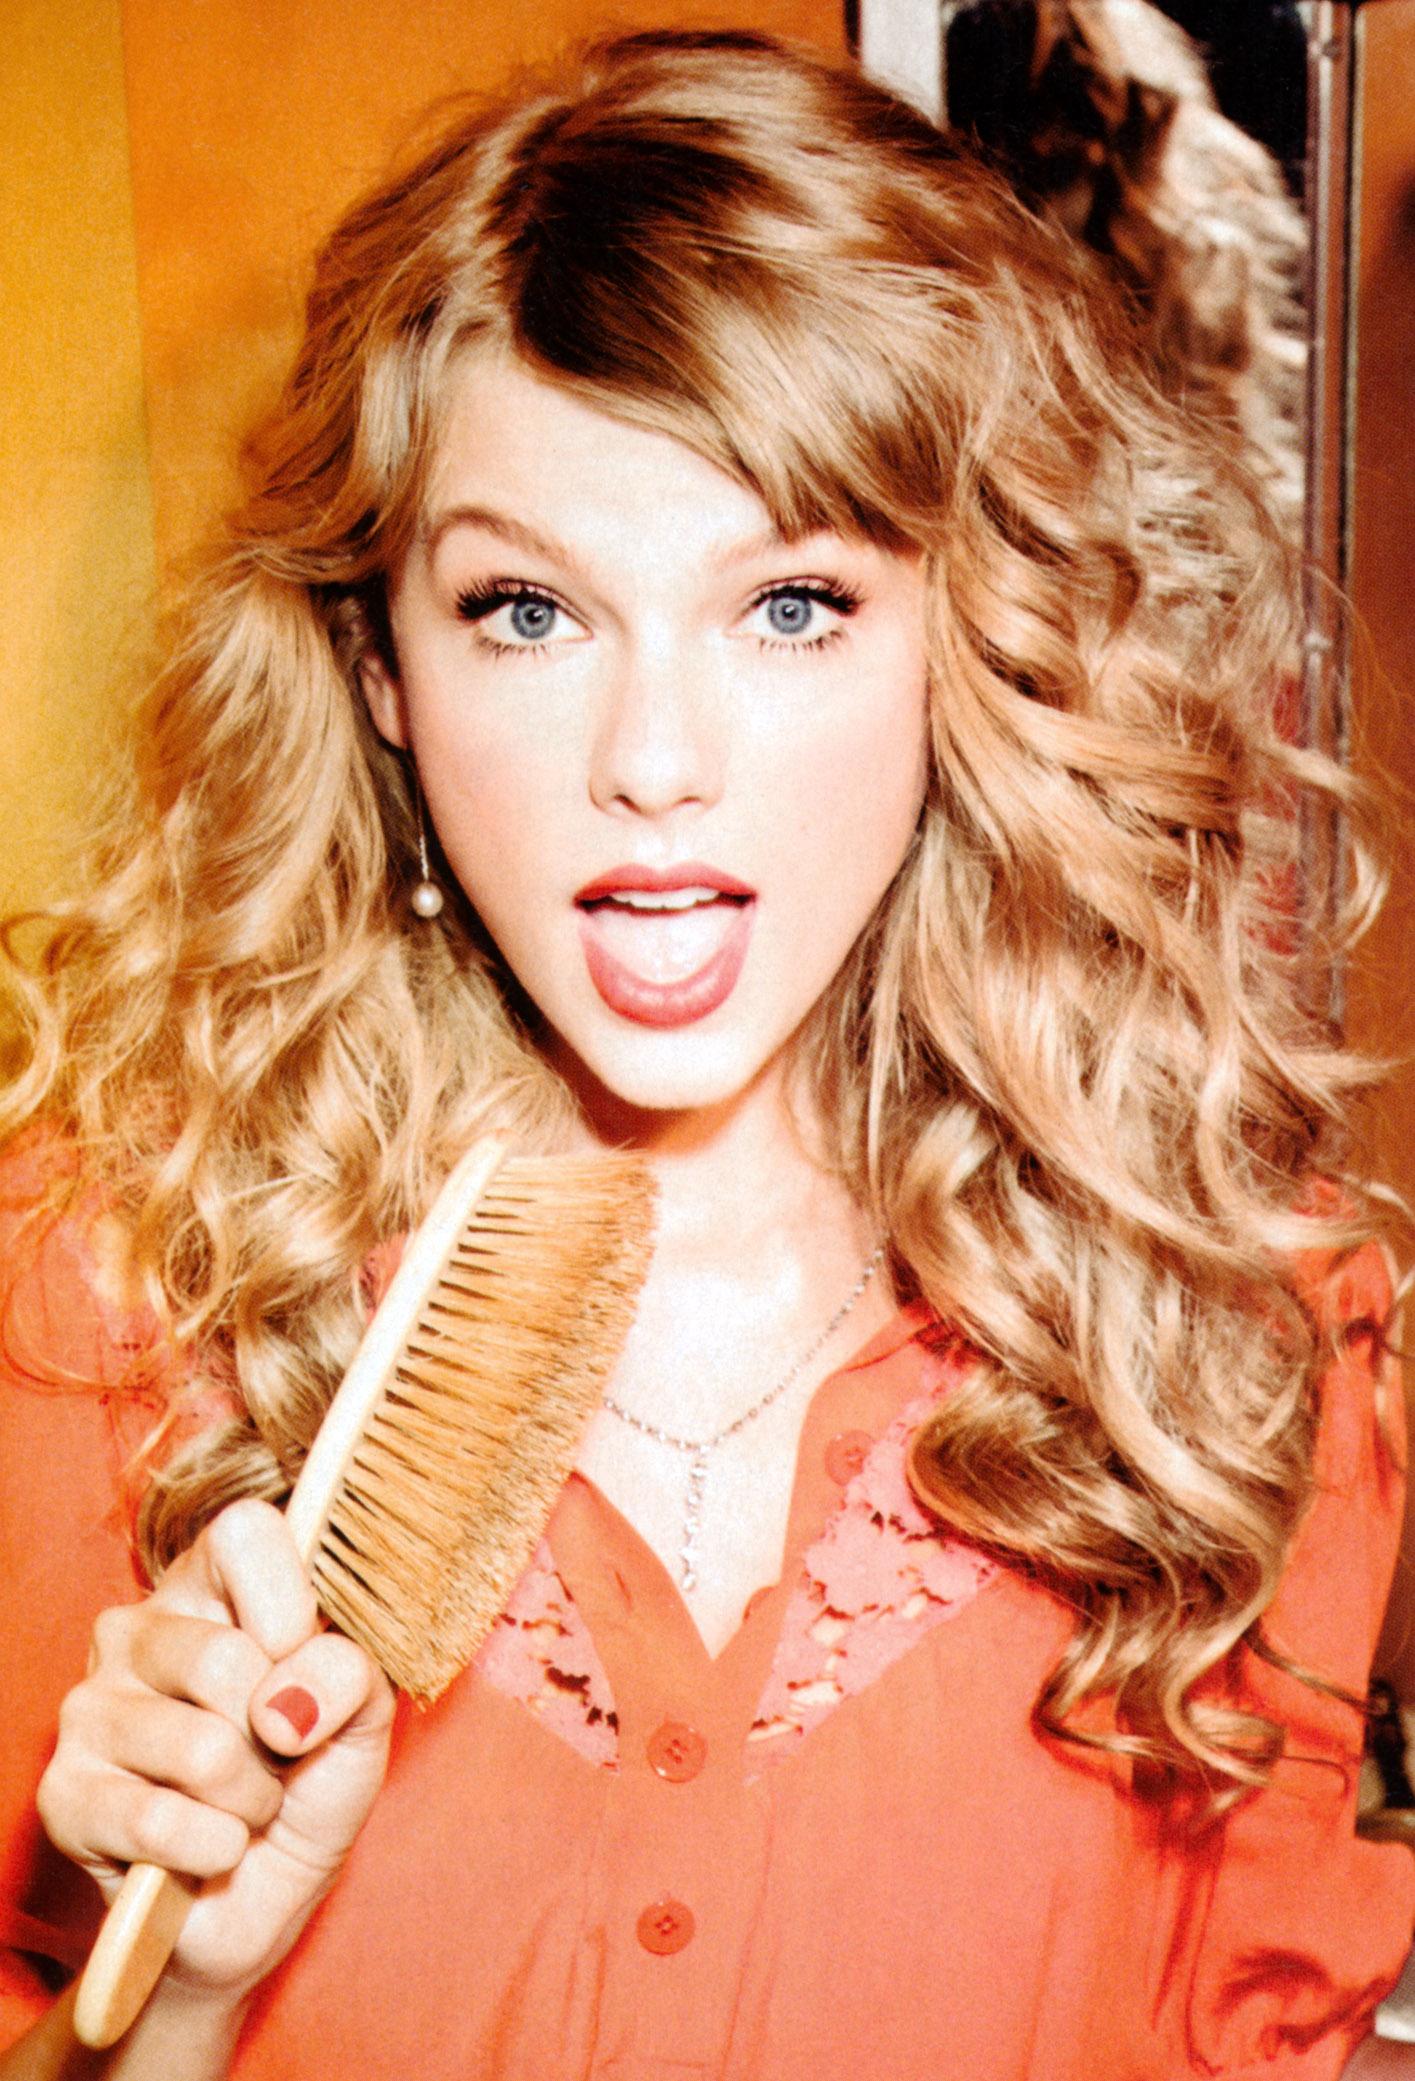 Kim Kardashian Hd Wallpaper Taylor Swift In Glamour Usa 08 Gotceleb